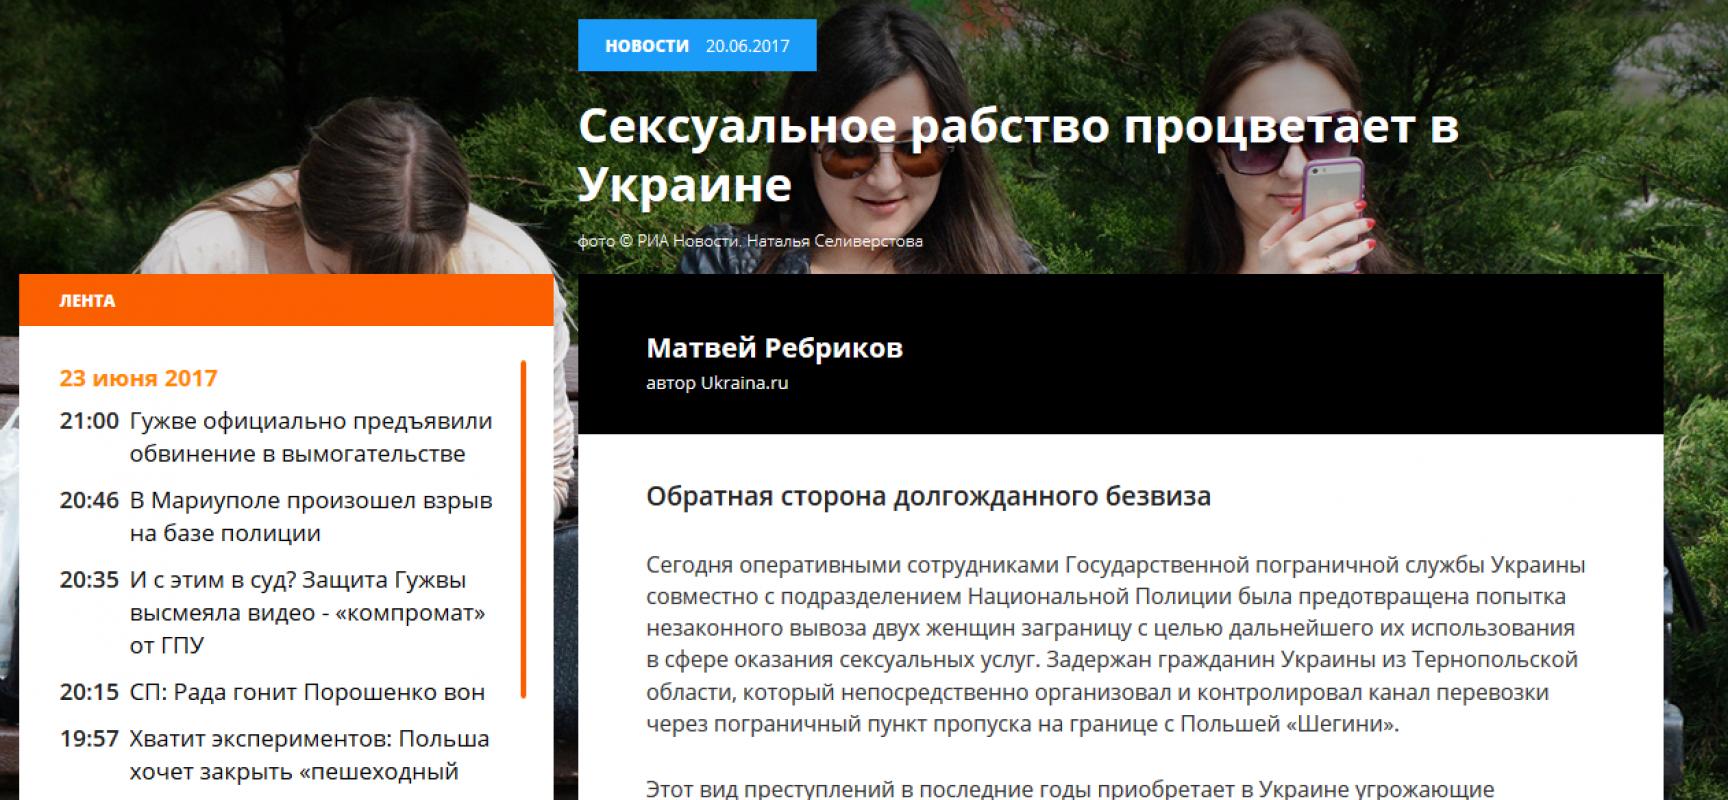 FAKE: L'introduzione del regime «senza visti» aumenta la schiavitù sessuale in Ucraina